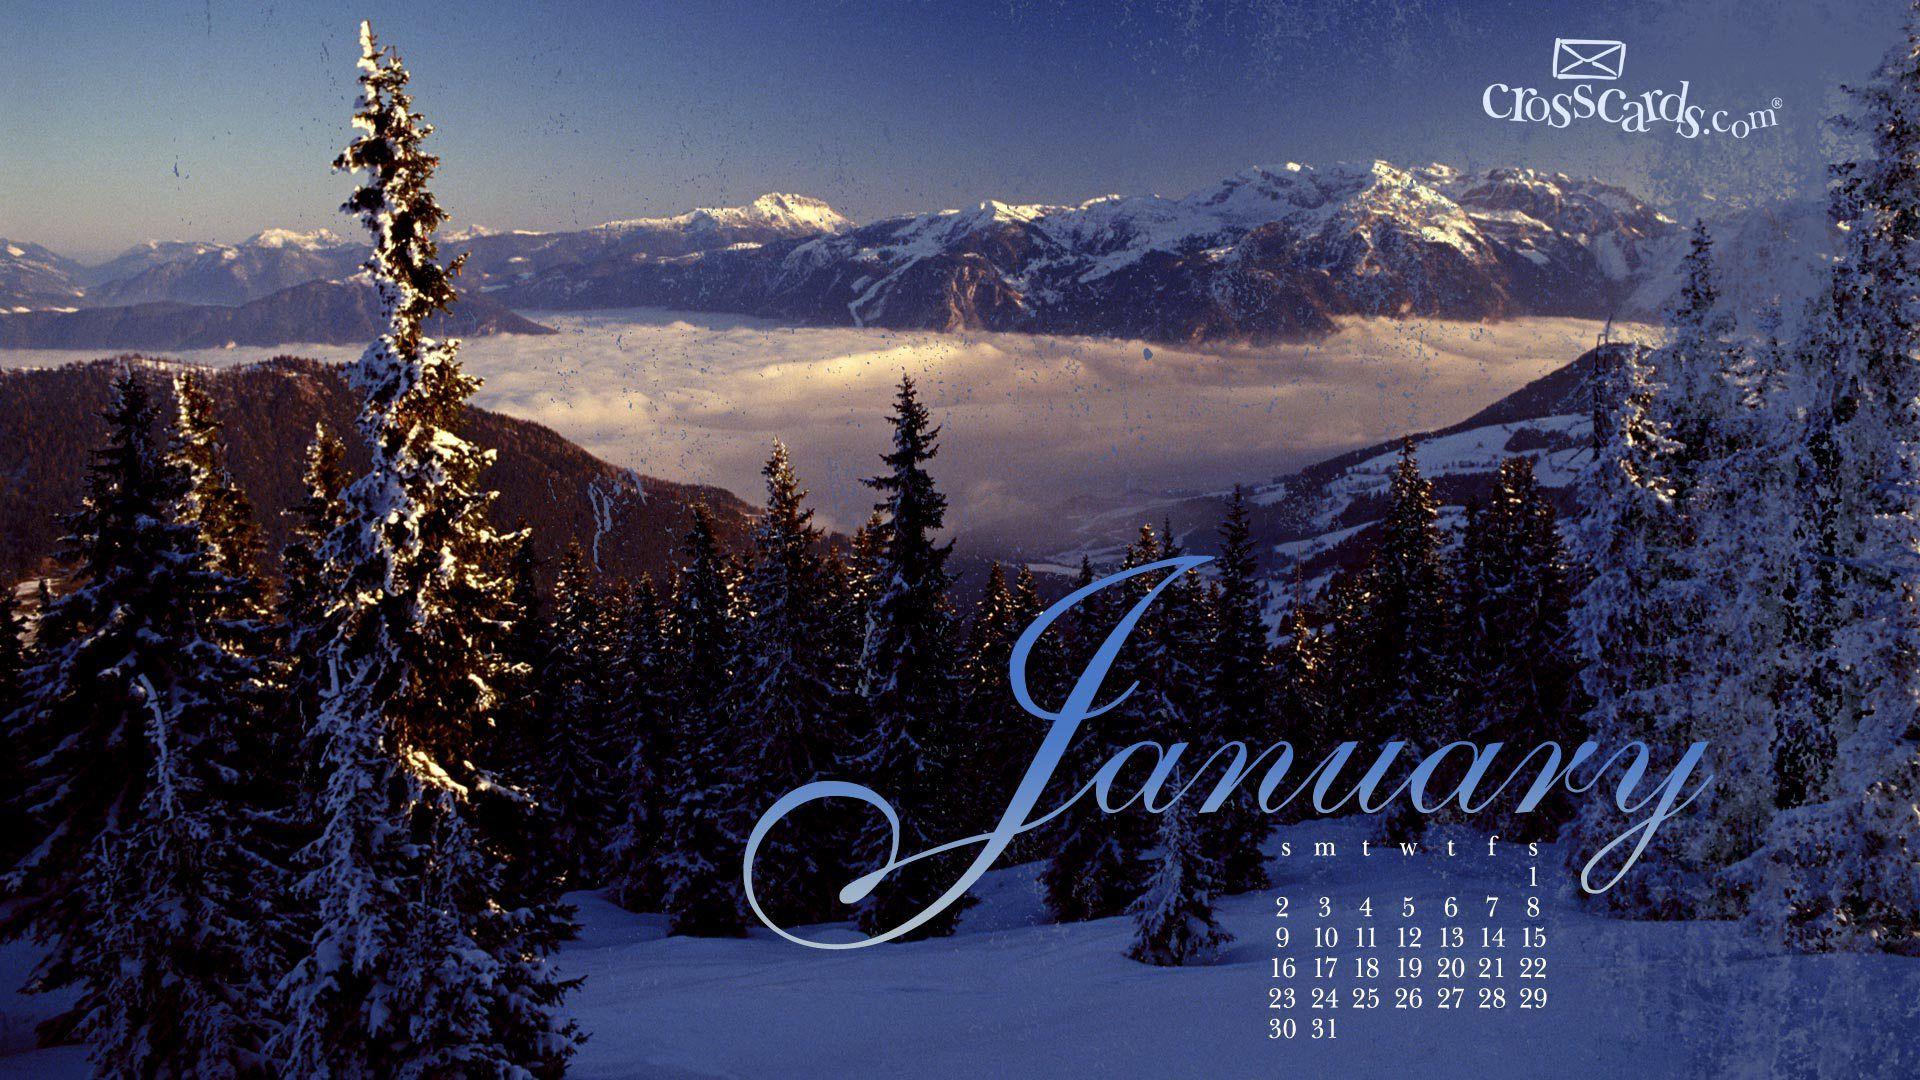 Crosscards Wallpaper Monthly Calendars. Wallpaper January